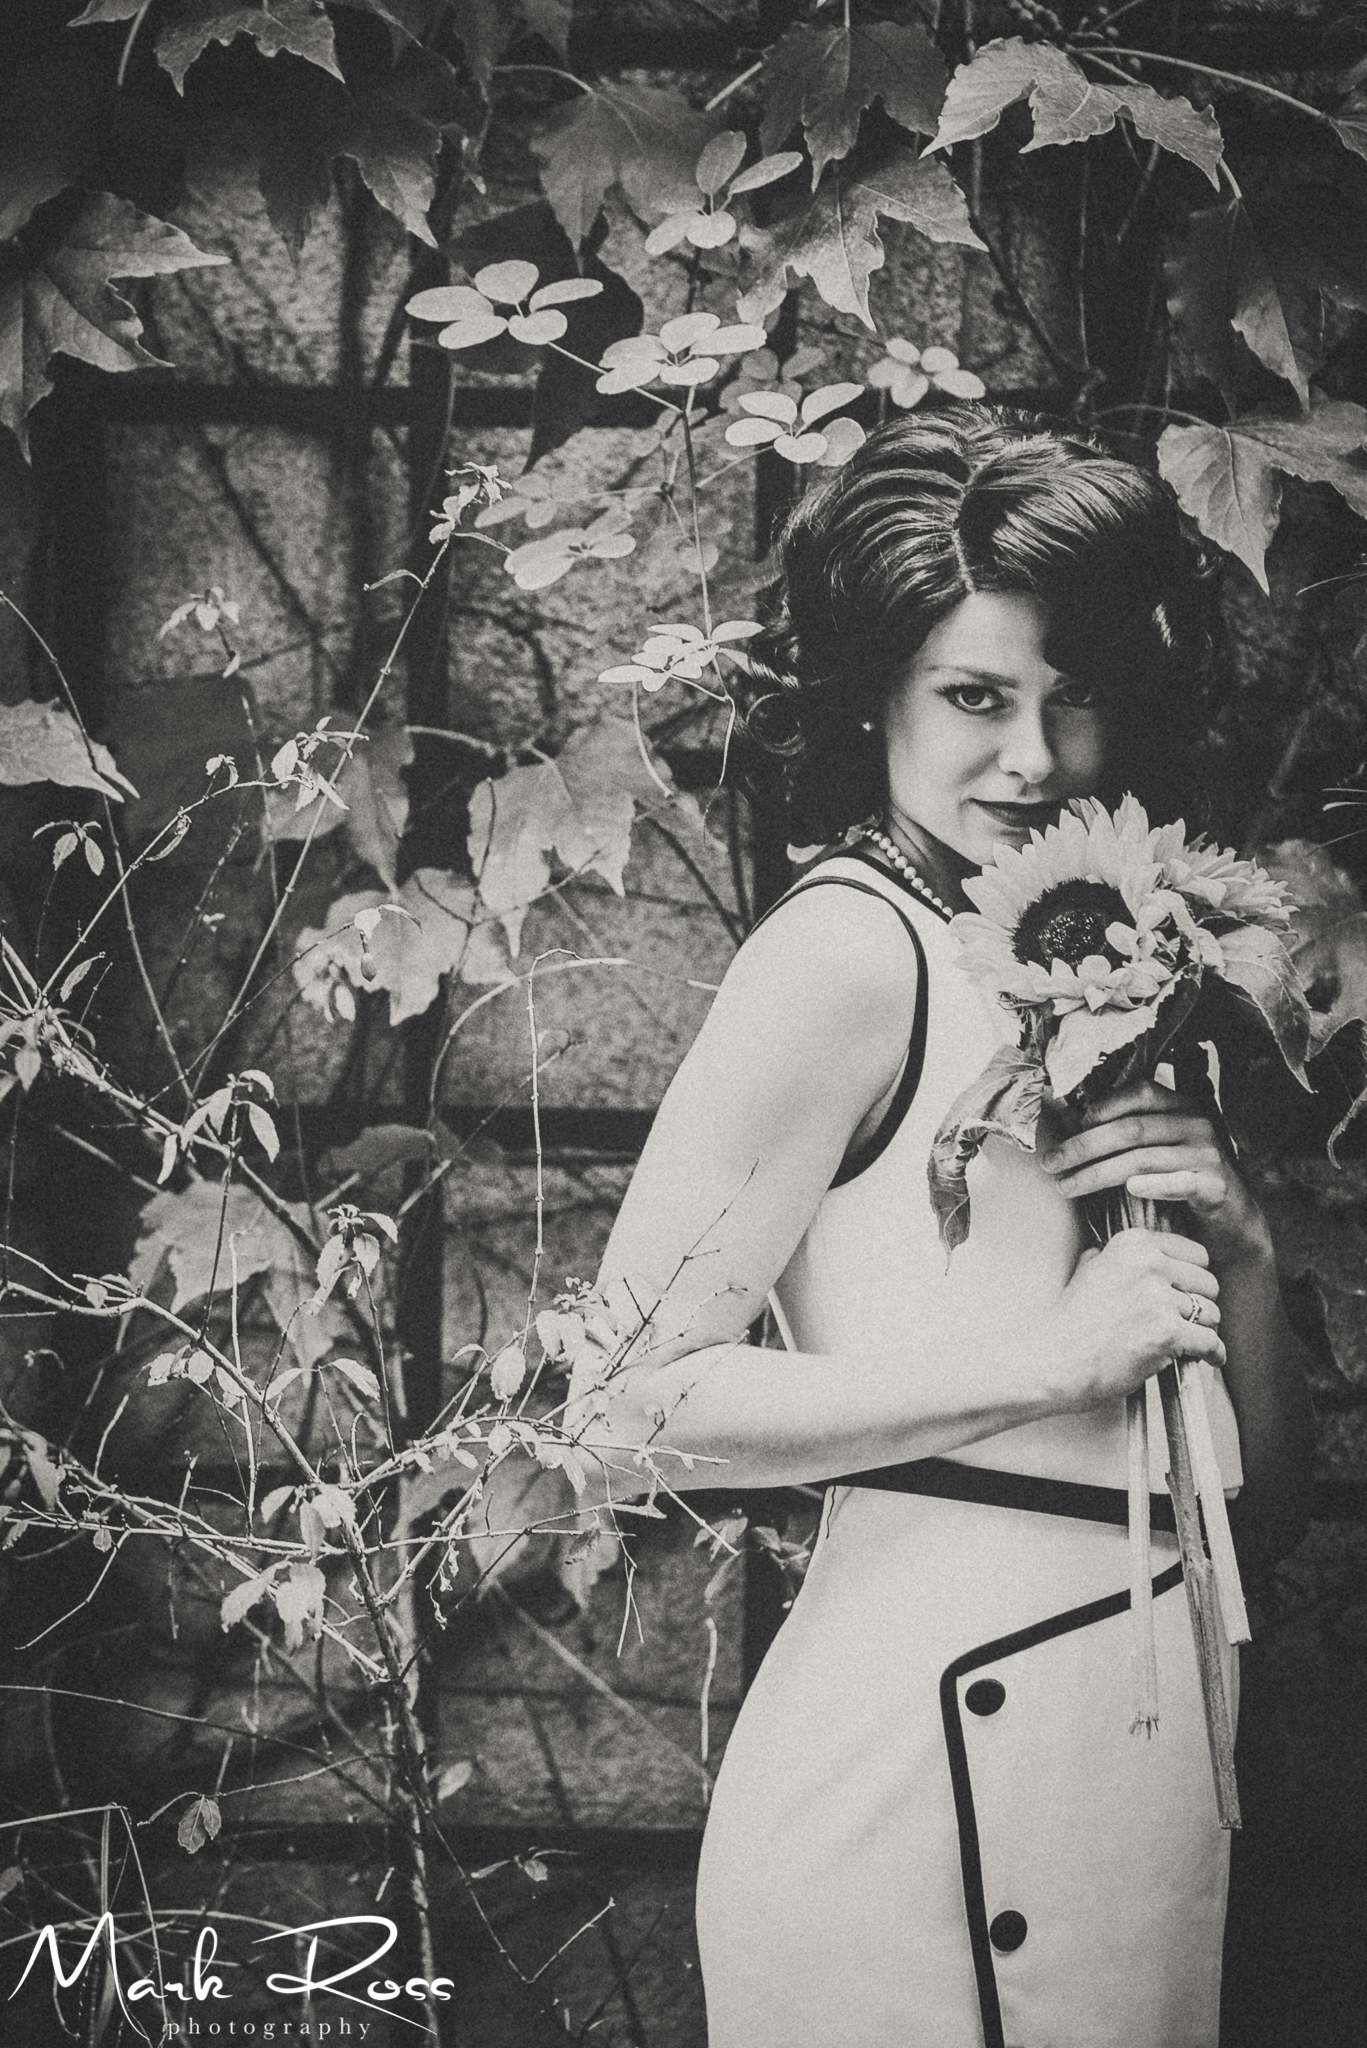 Denver-Portrait-Photographer-Mark-Ross-Photography-Maggie-Paris-2018-50s-black-and-white-dress-Web-Resolution-Watermarked-1.jpg